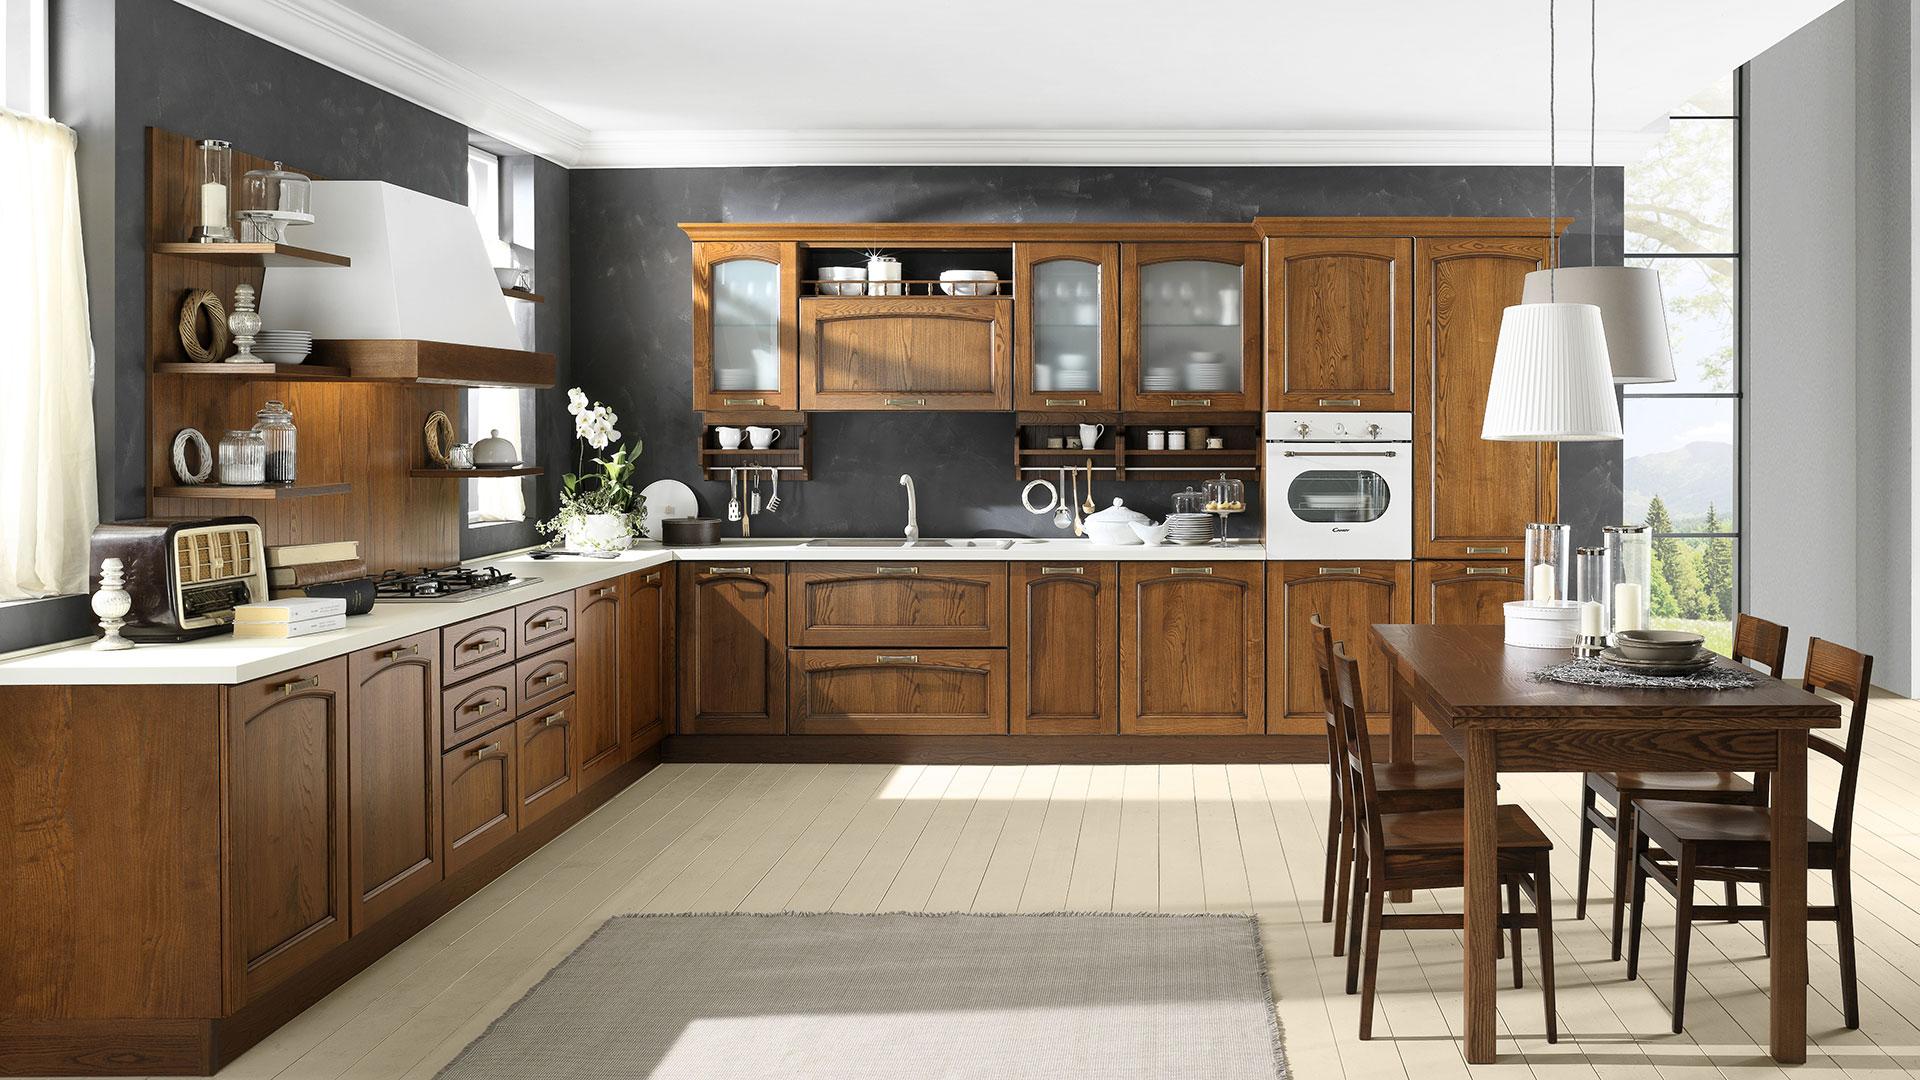 Cucine classiche evo cucine for Cucine classiche